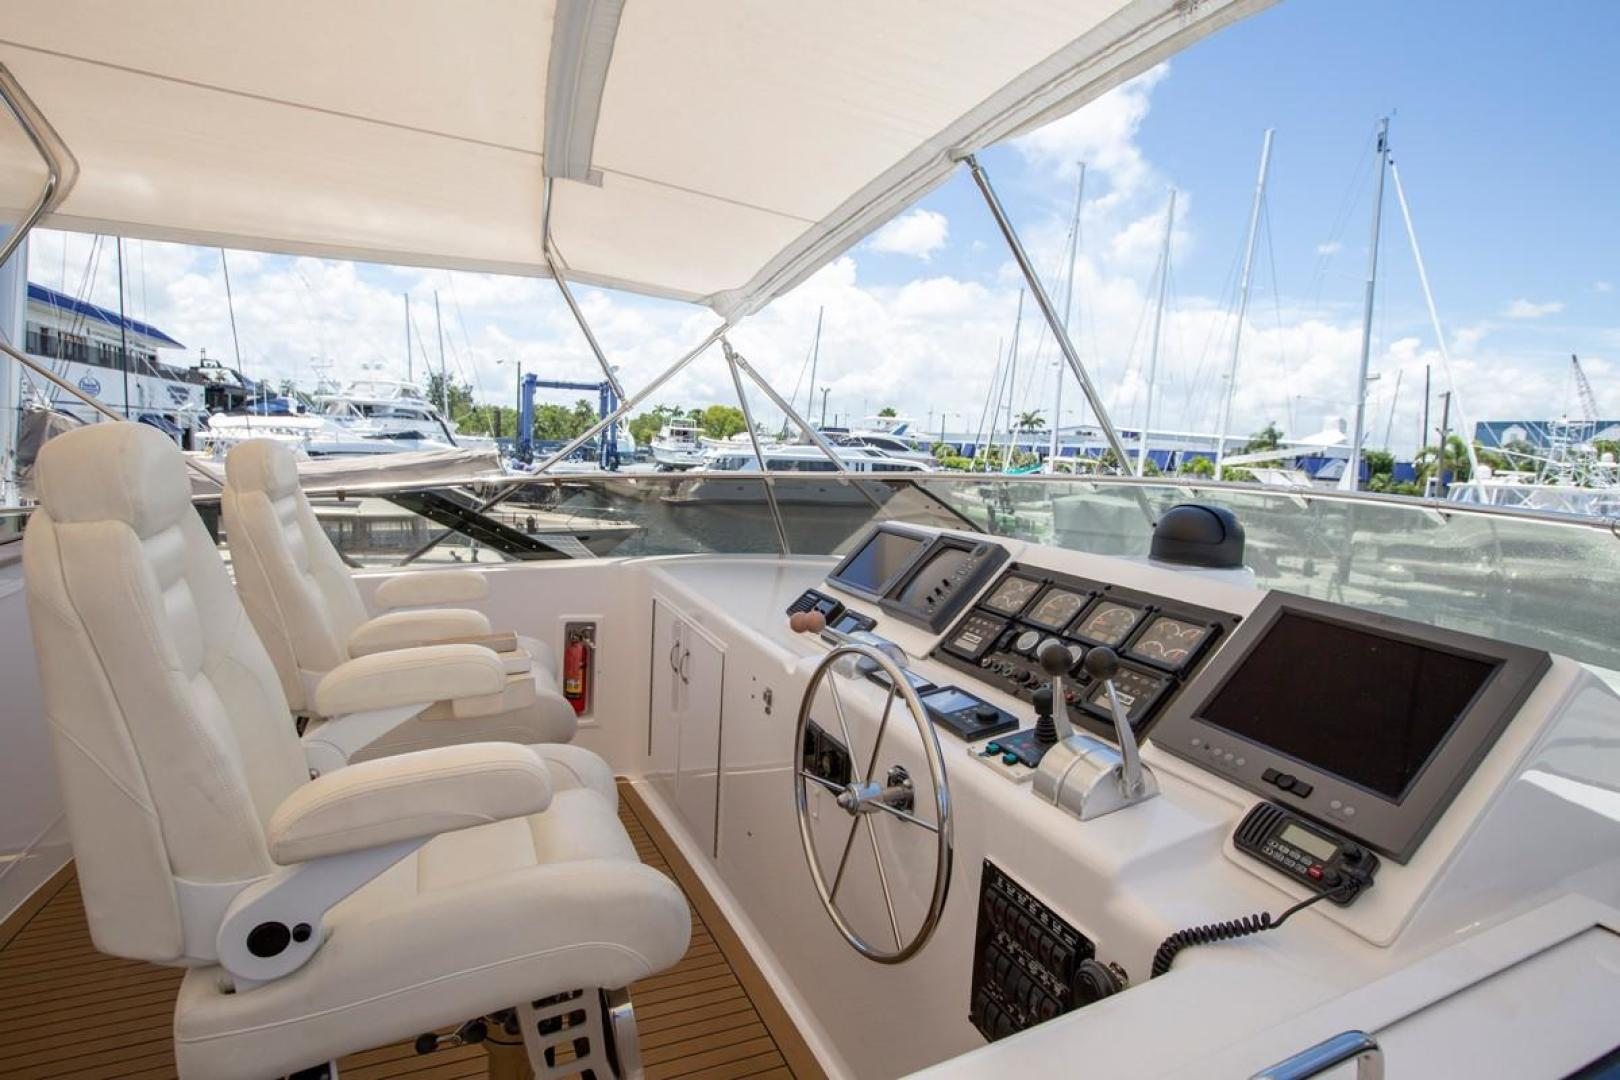 Hatteras-Cockpit Motor Yacht 2000-Getaway Ft. Lauderdale-Florida-United States-977402 | Thumbnail